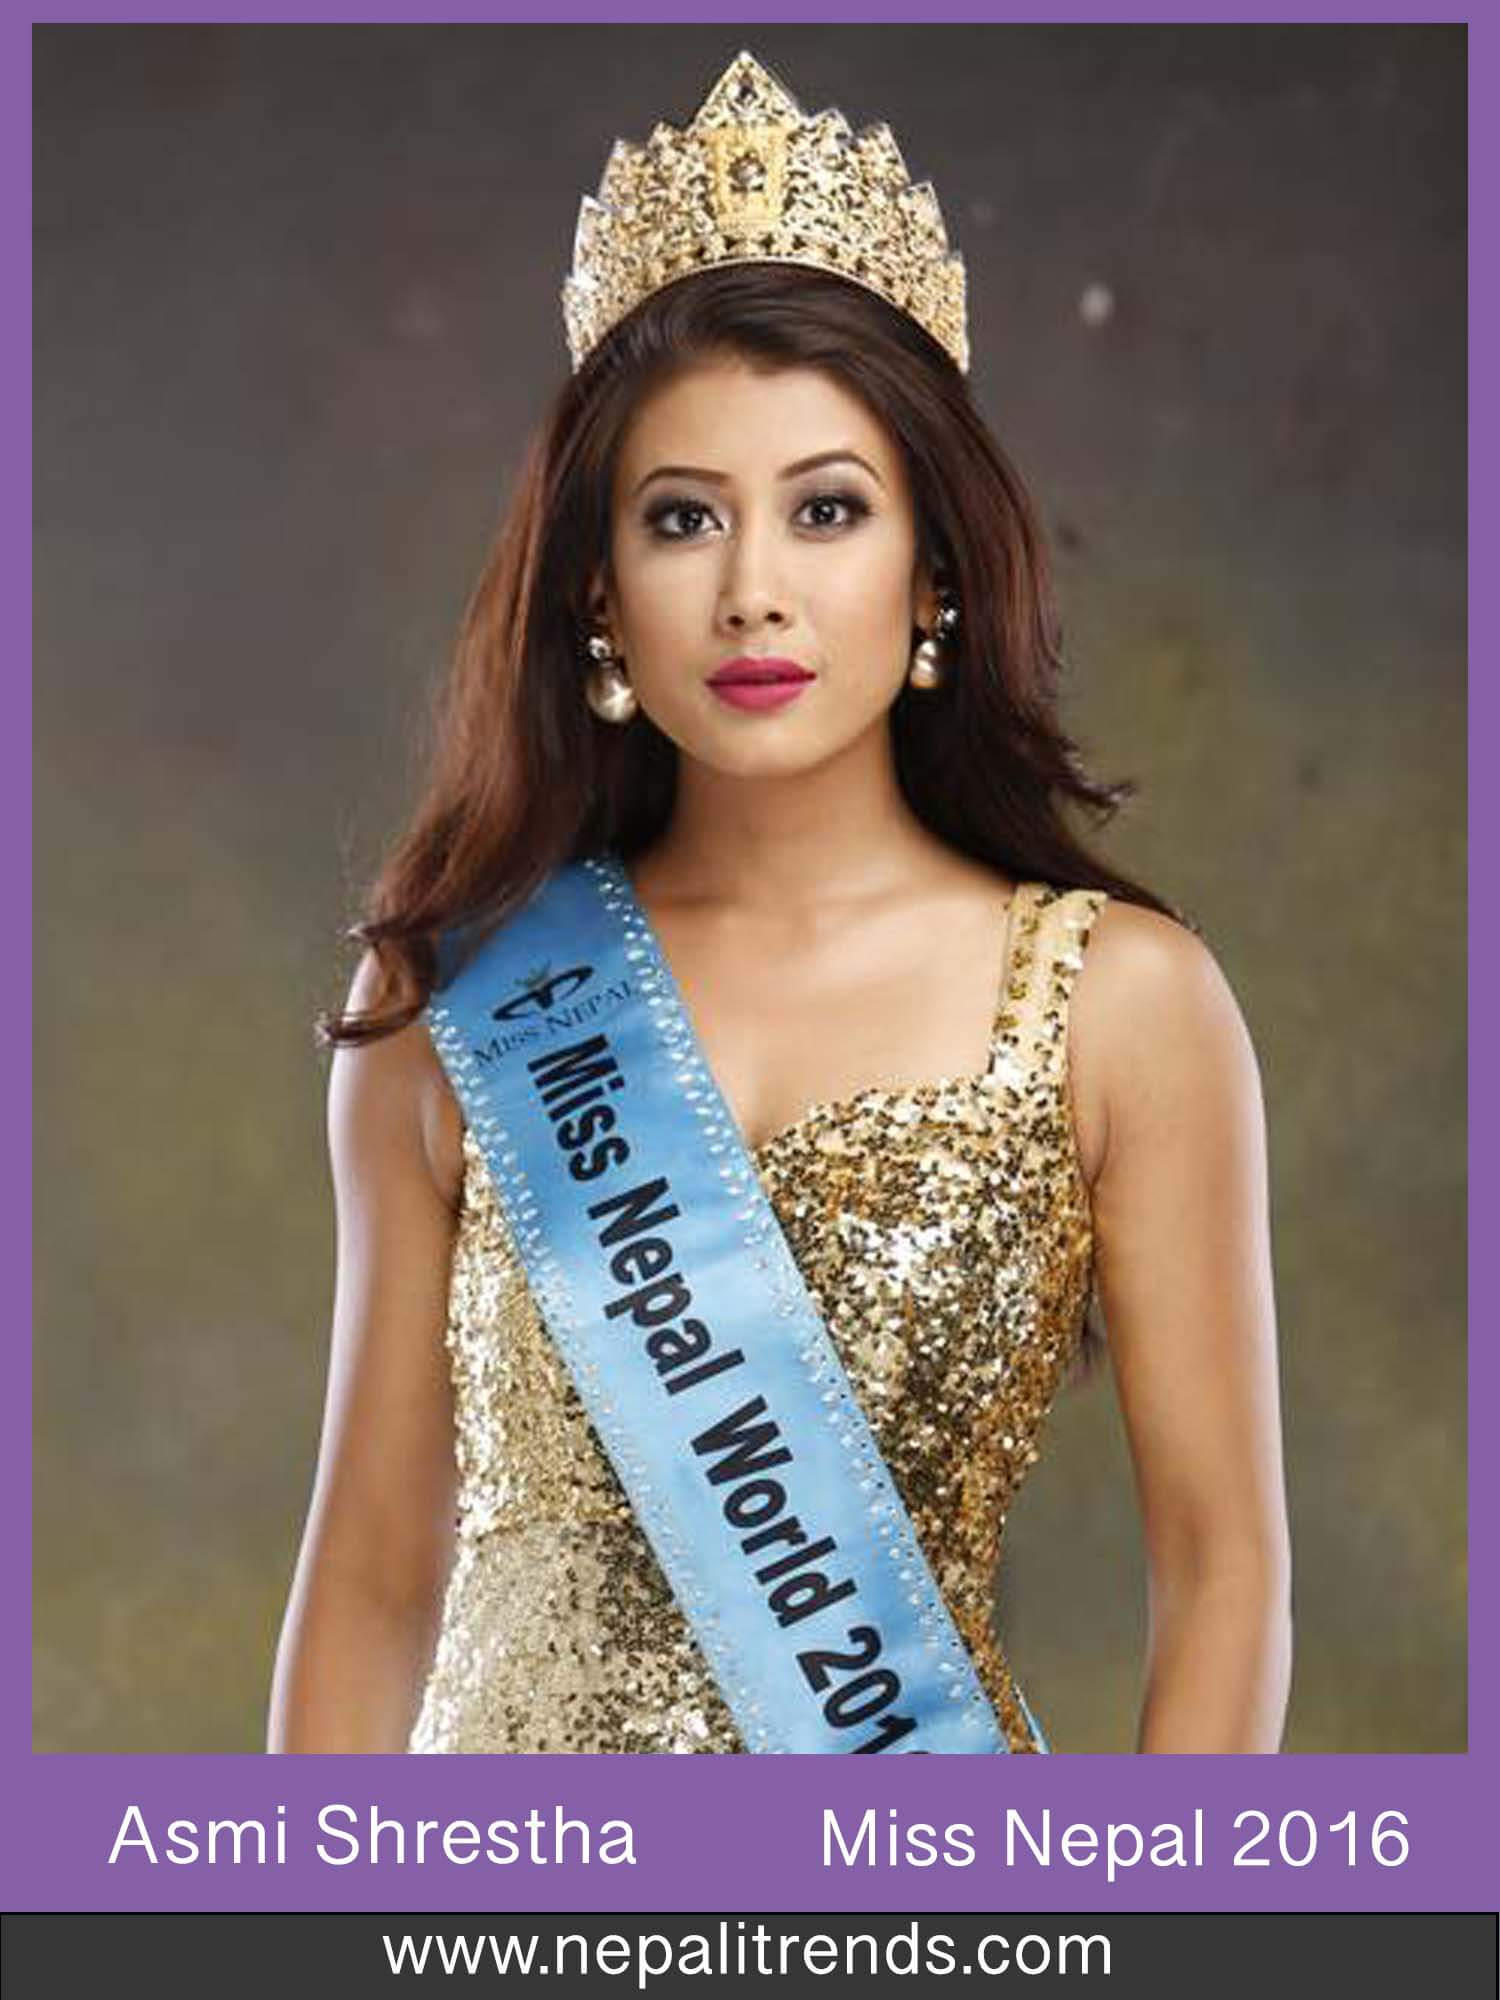 Asmi Shrestha Miss Nepal 2016